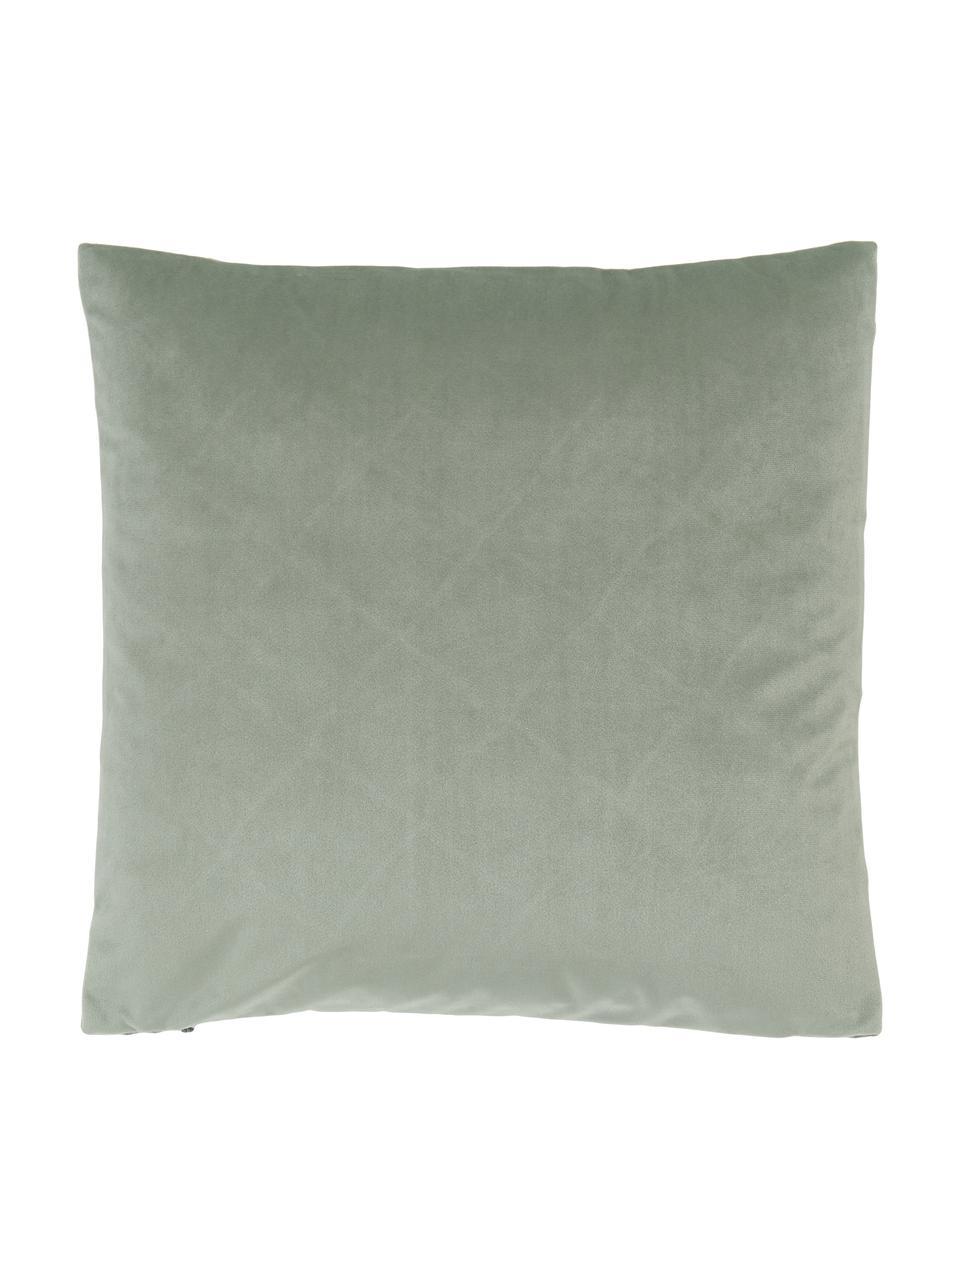 Samt-Kissenhülle Luka in Salbeigrün mit Struktur-Karomuster, Samt (100% Polyester), Grün, 40 x 40 cm